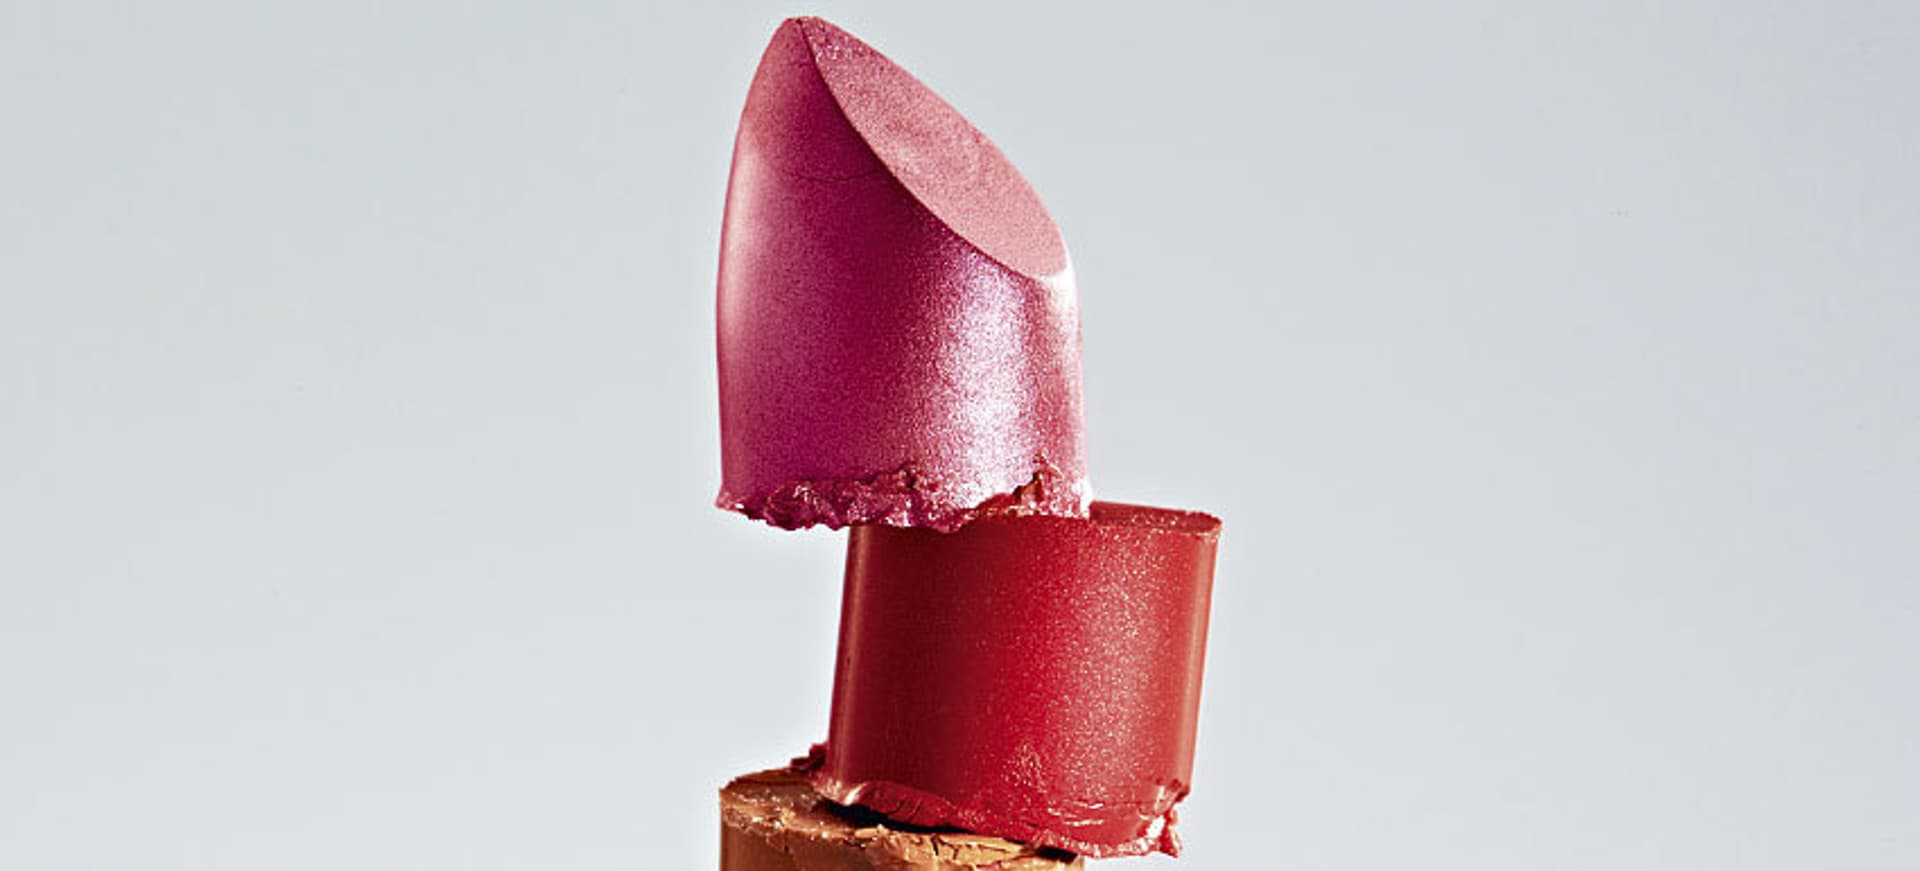 Lippenstift Naturkosmetik